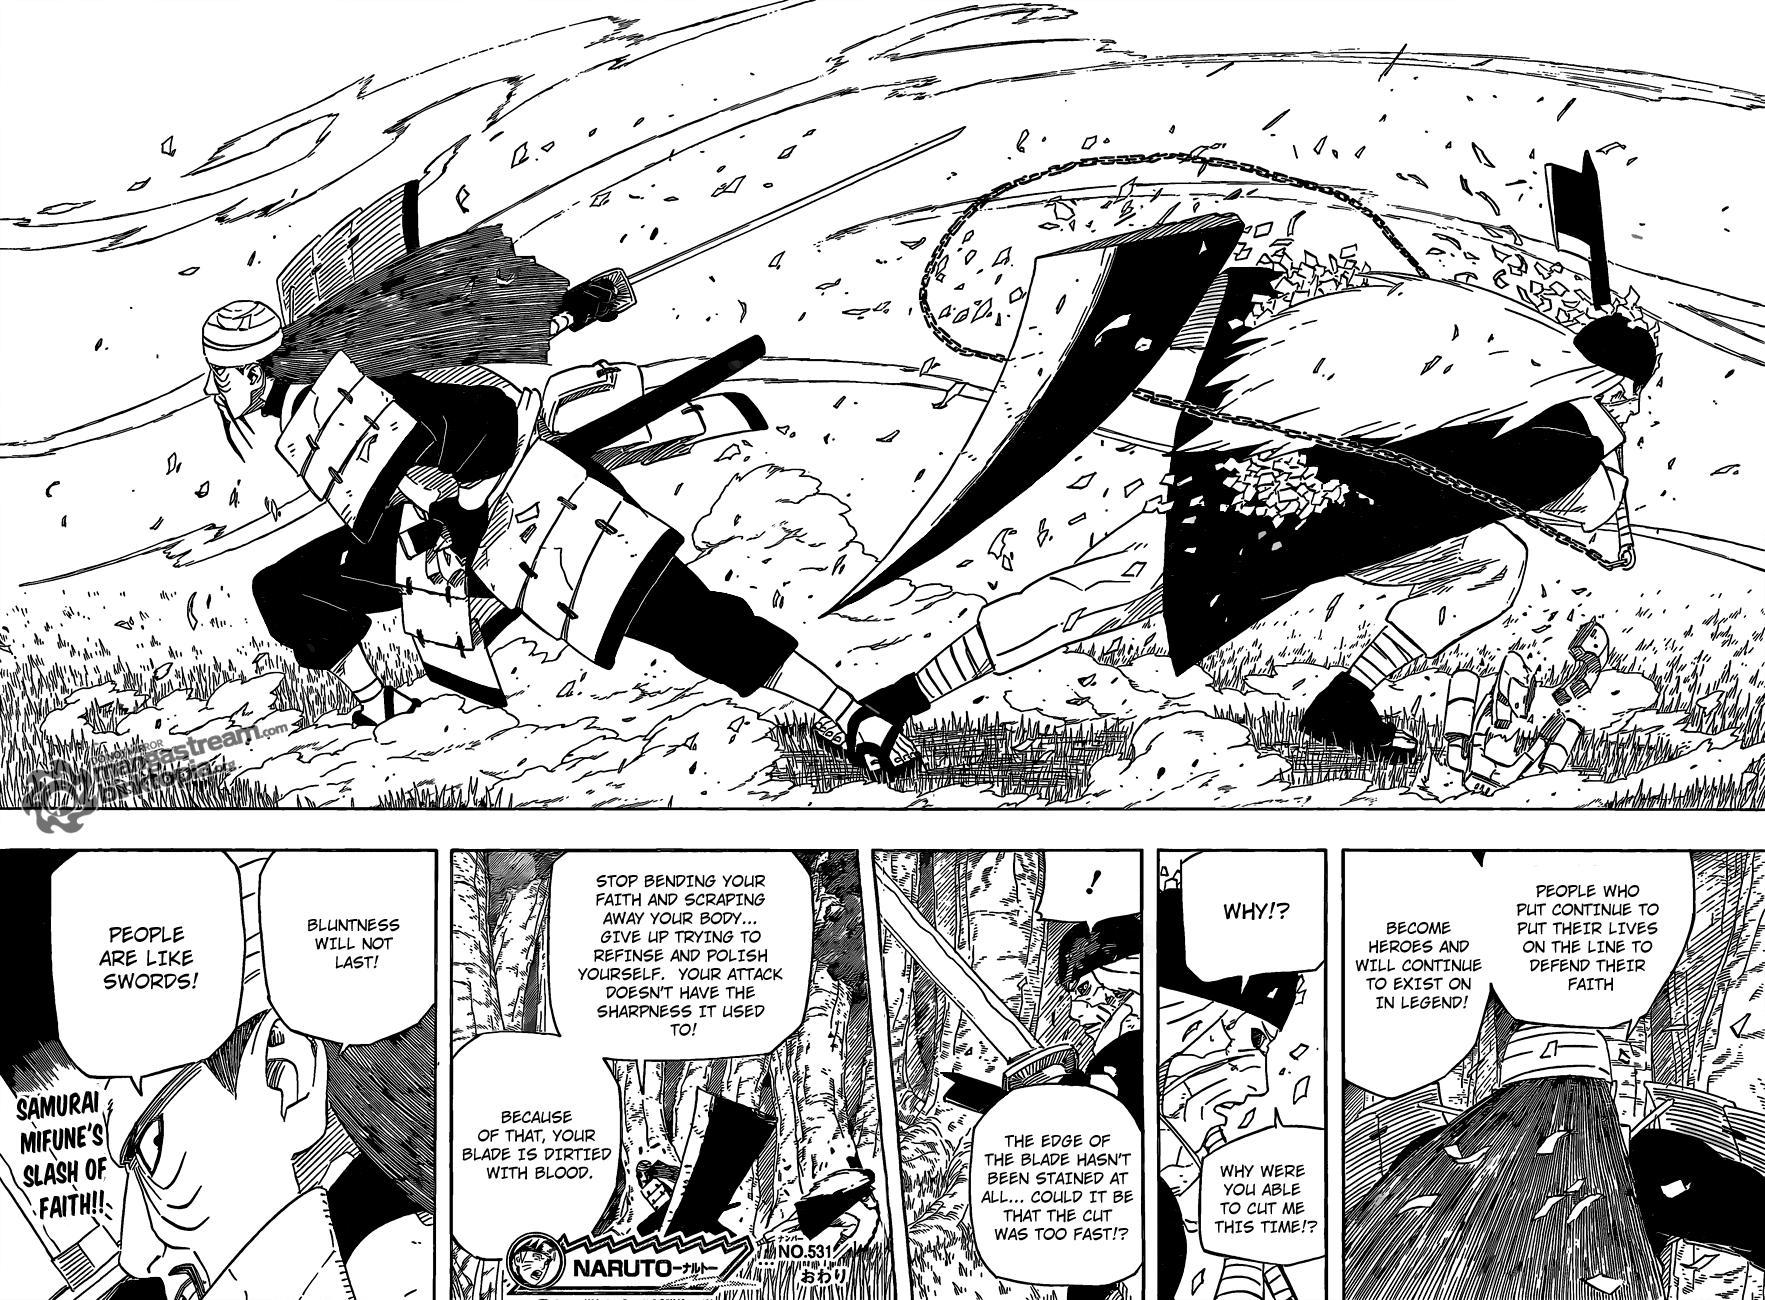 Naruto Chapter 531 – The Dull Blade | SHANNARO!!!